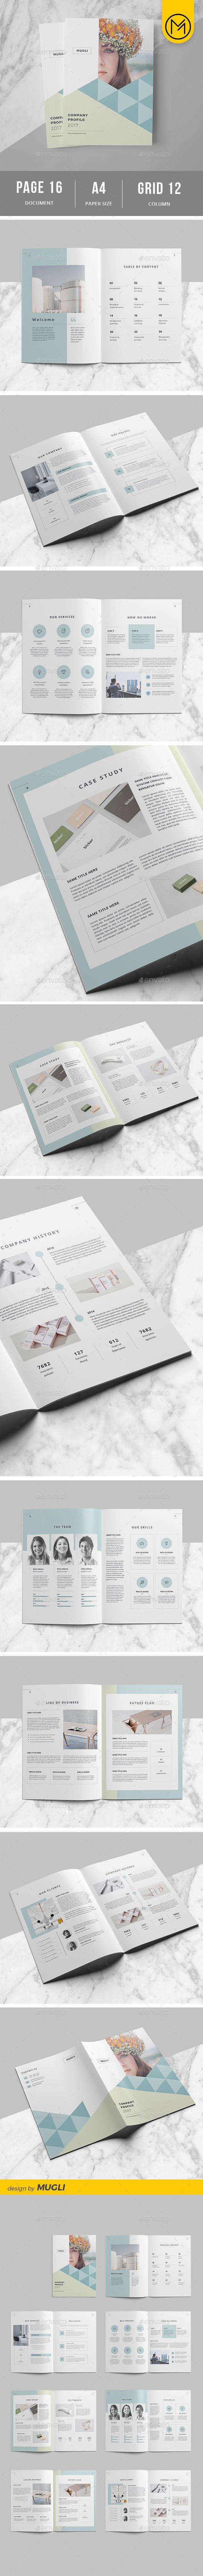 #Company Profile - Corporate #Brochures Download here: https://graphicriver.net/item/company-profile/19420339?ref=alena994